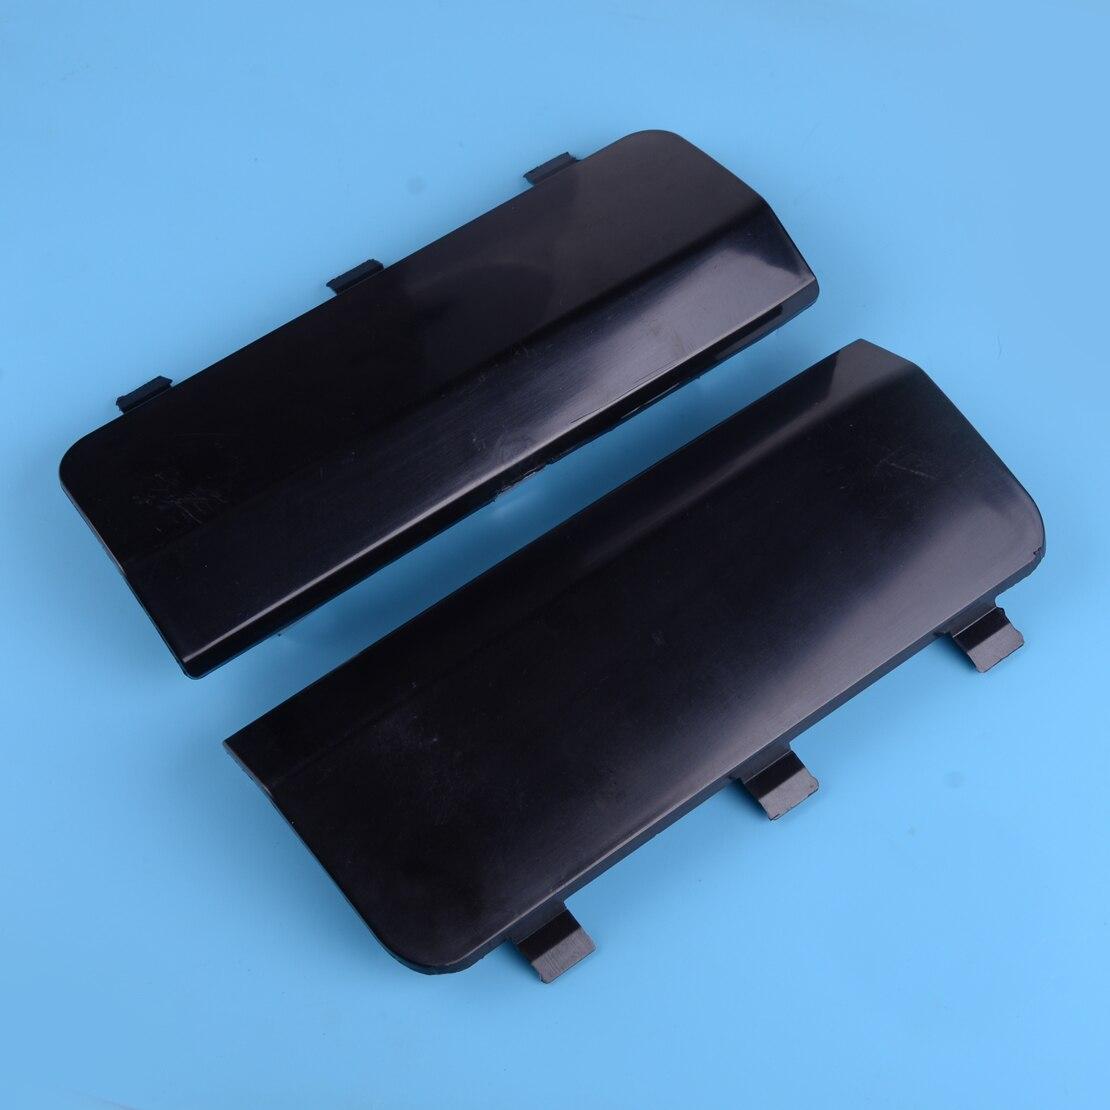 Beler 2 adet arka tampon Tow kanca kapak Cap A1638801605 A1638801705 Mercedes için ML320 ML350 1998-2001 2002 2003 2004 2005